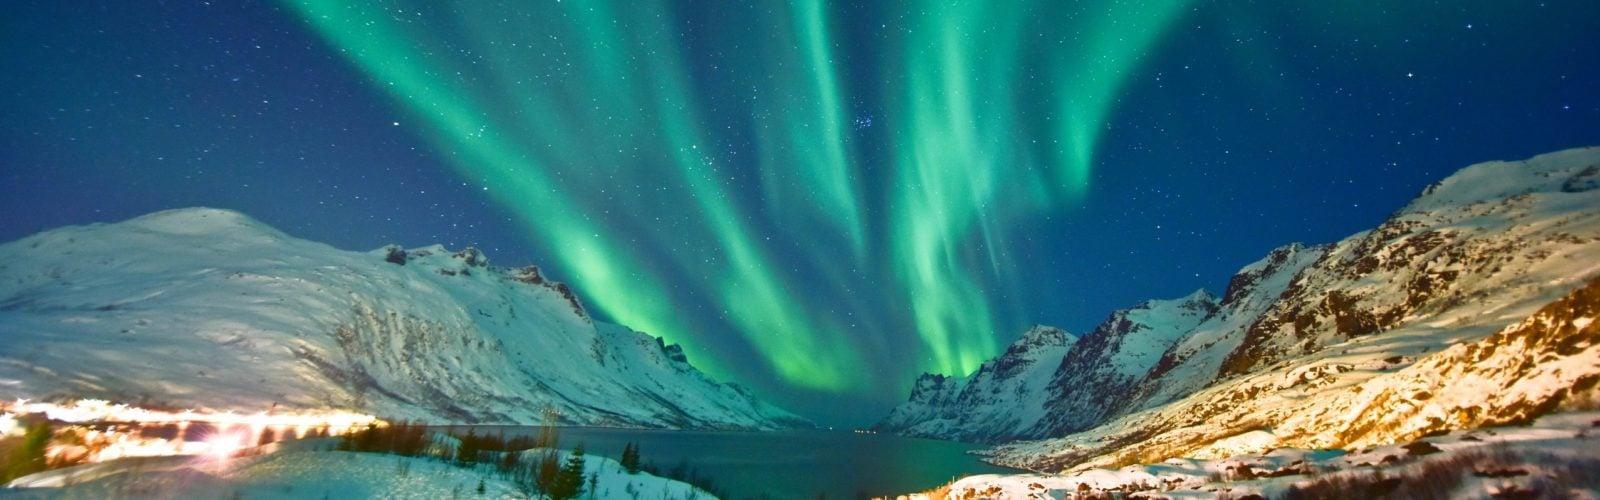 northern-lights-swedish-lapland